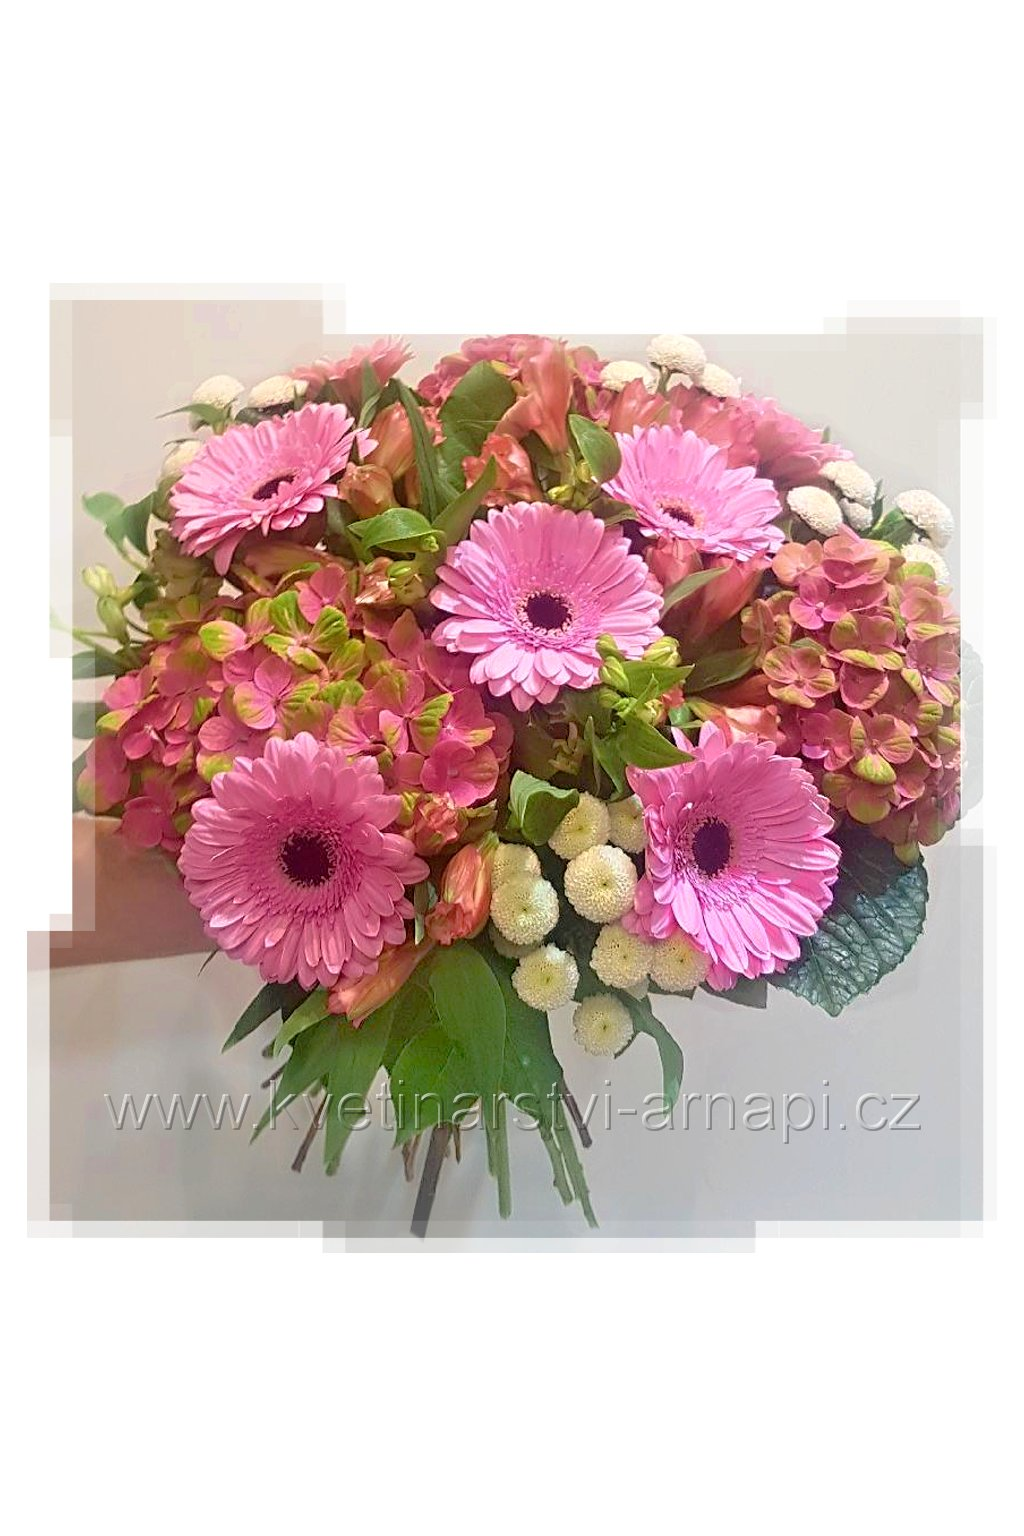 darkova kytice hortenzie santini gerbery kvetinarstvi arnapi